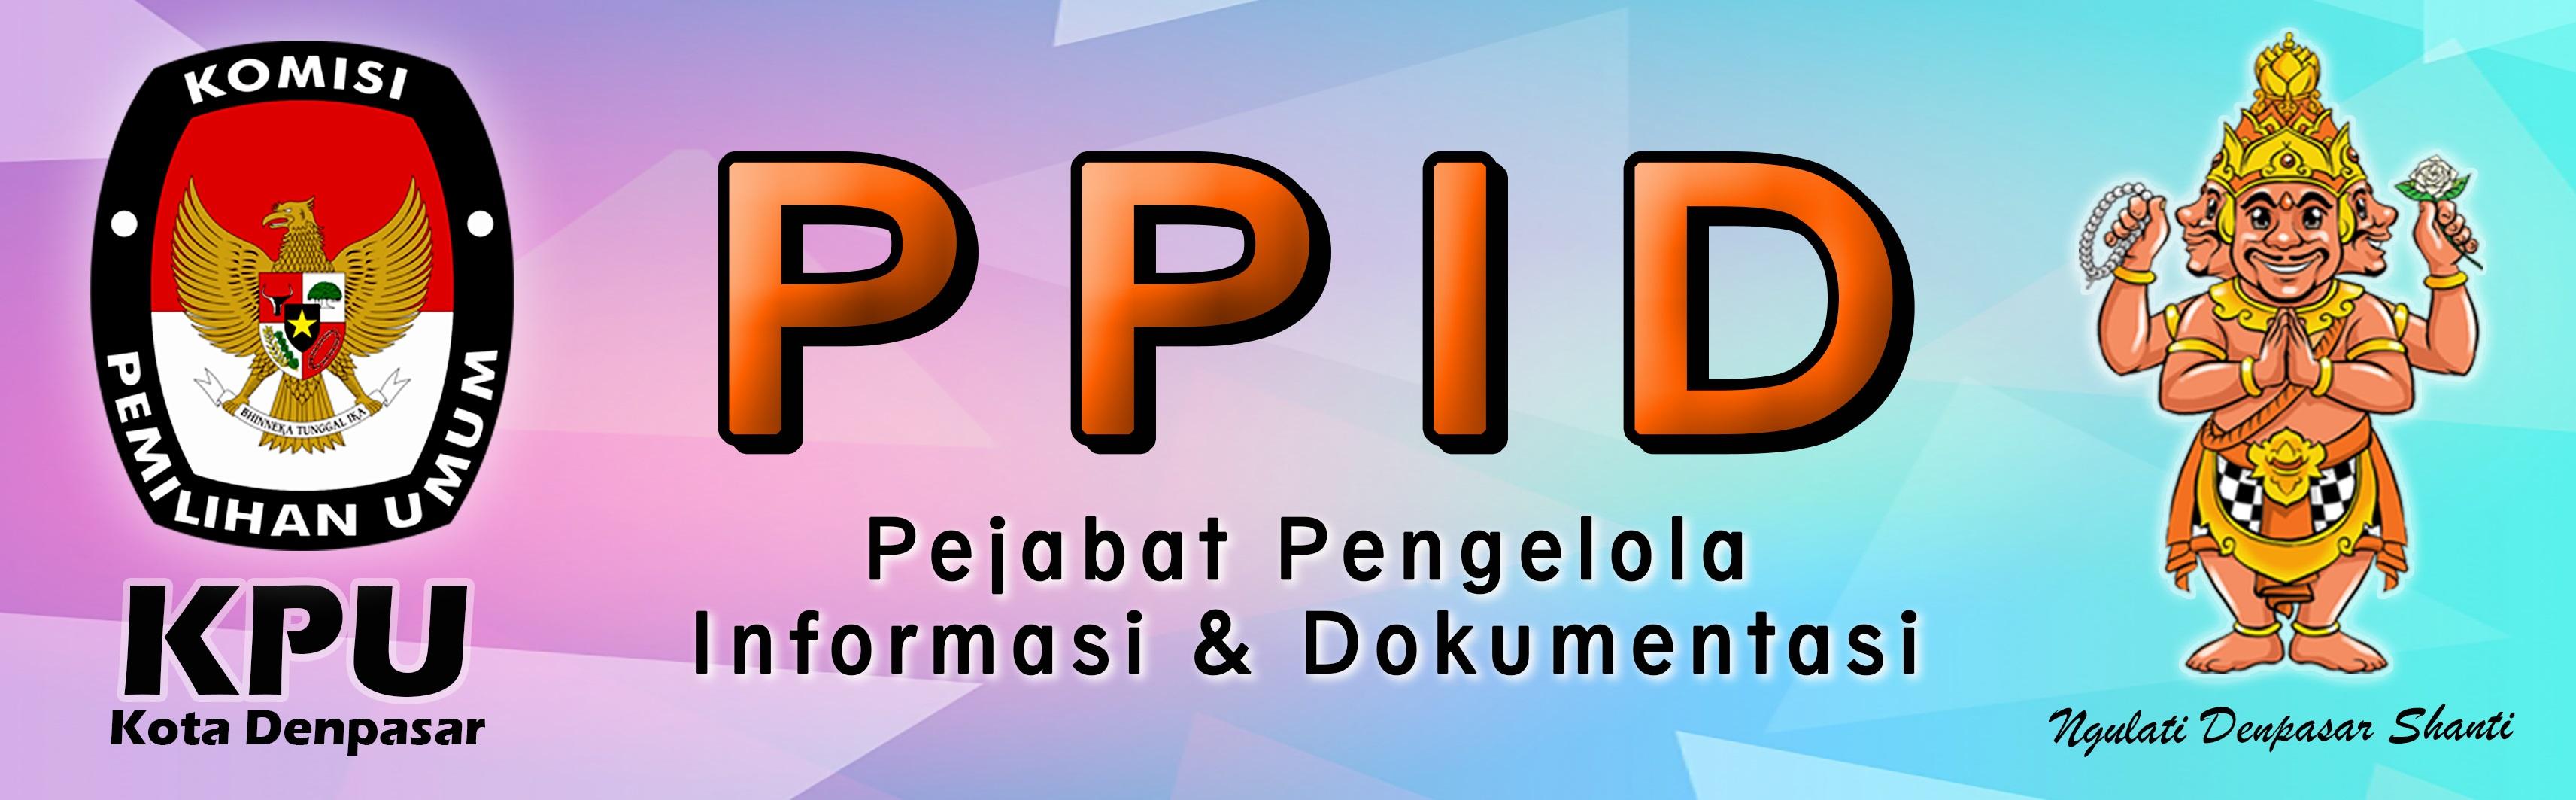 PPID KPU Kota Denpasar